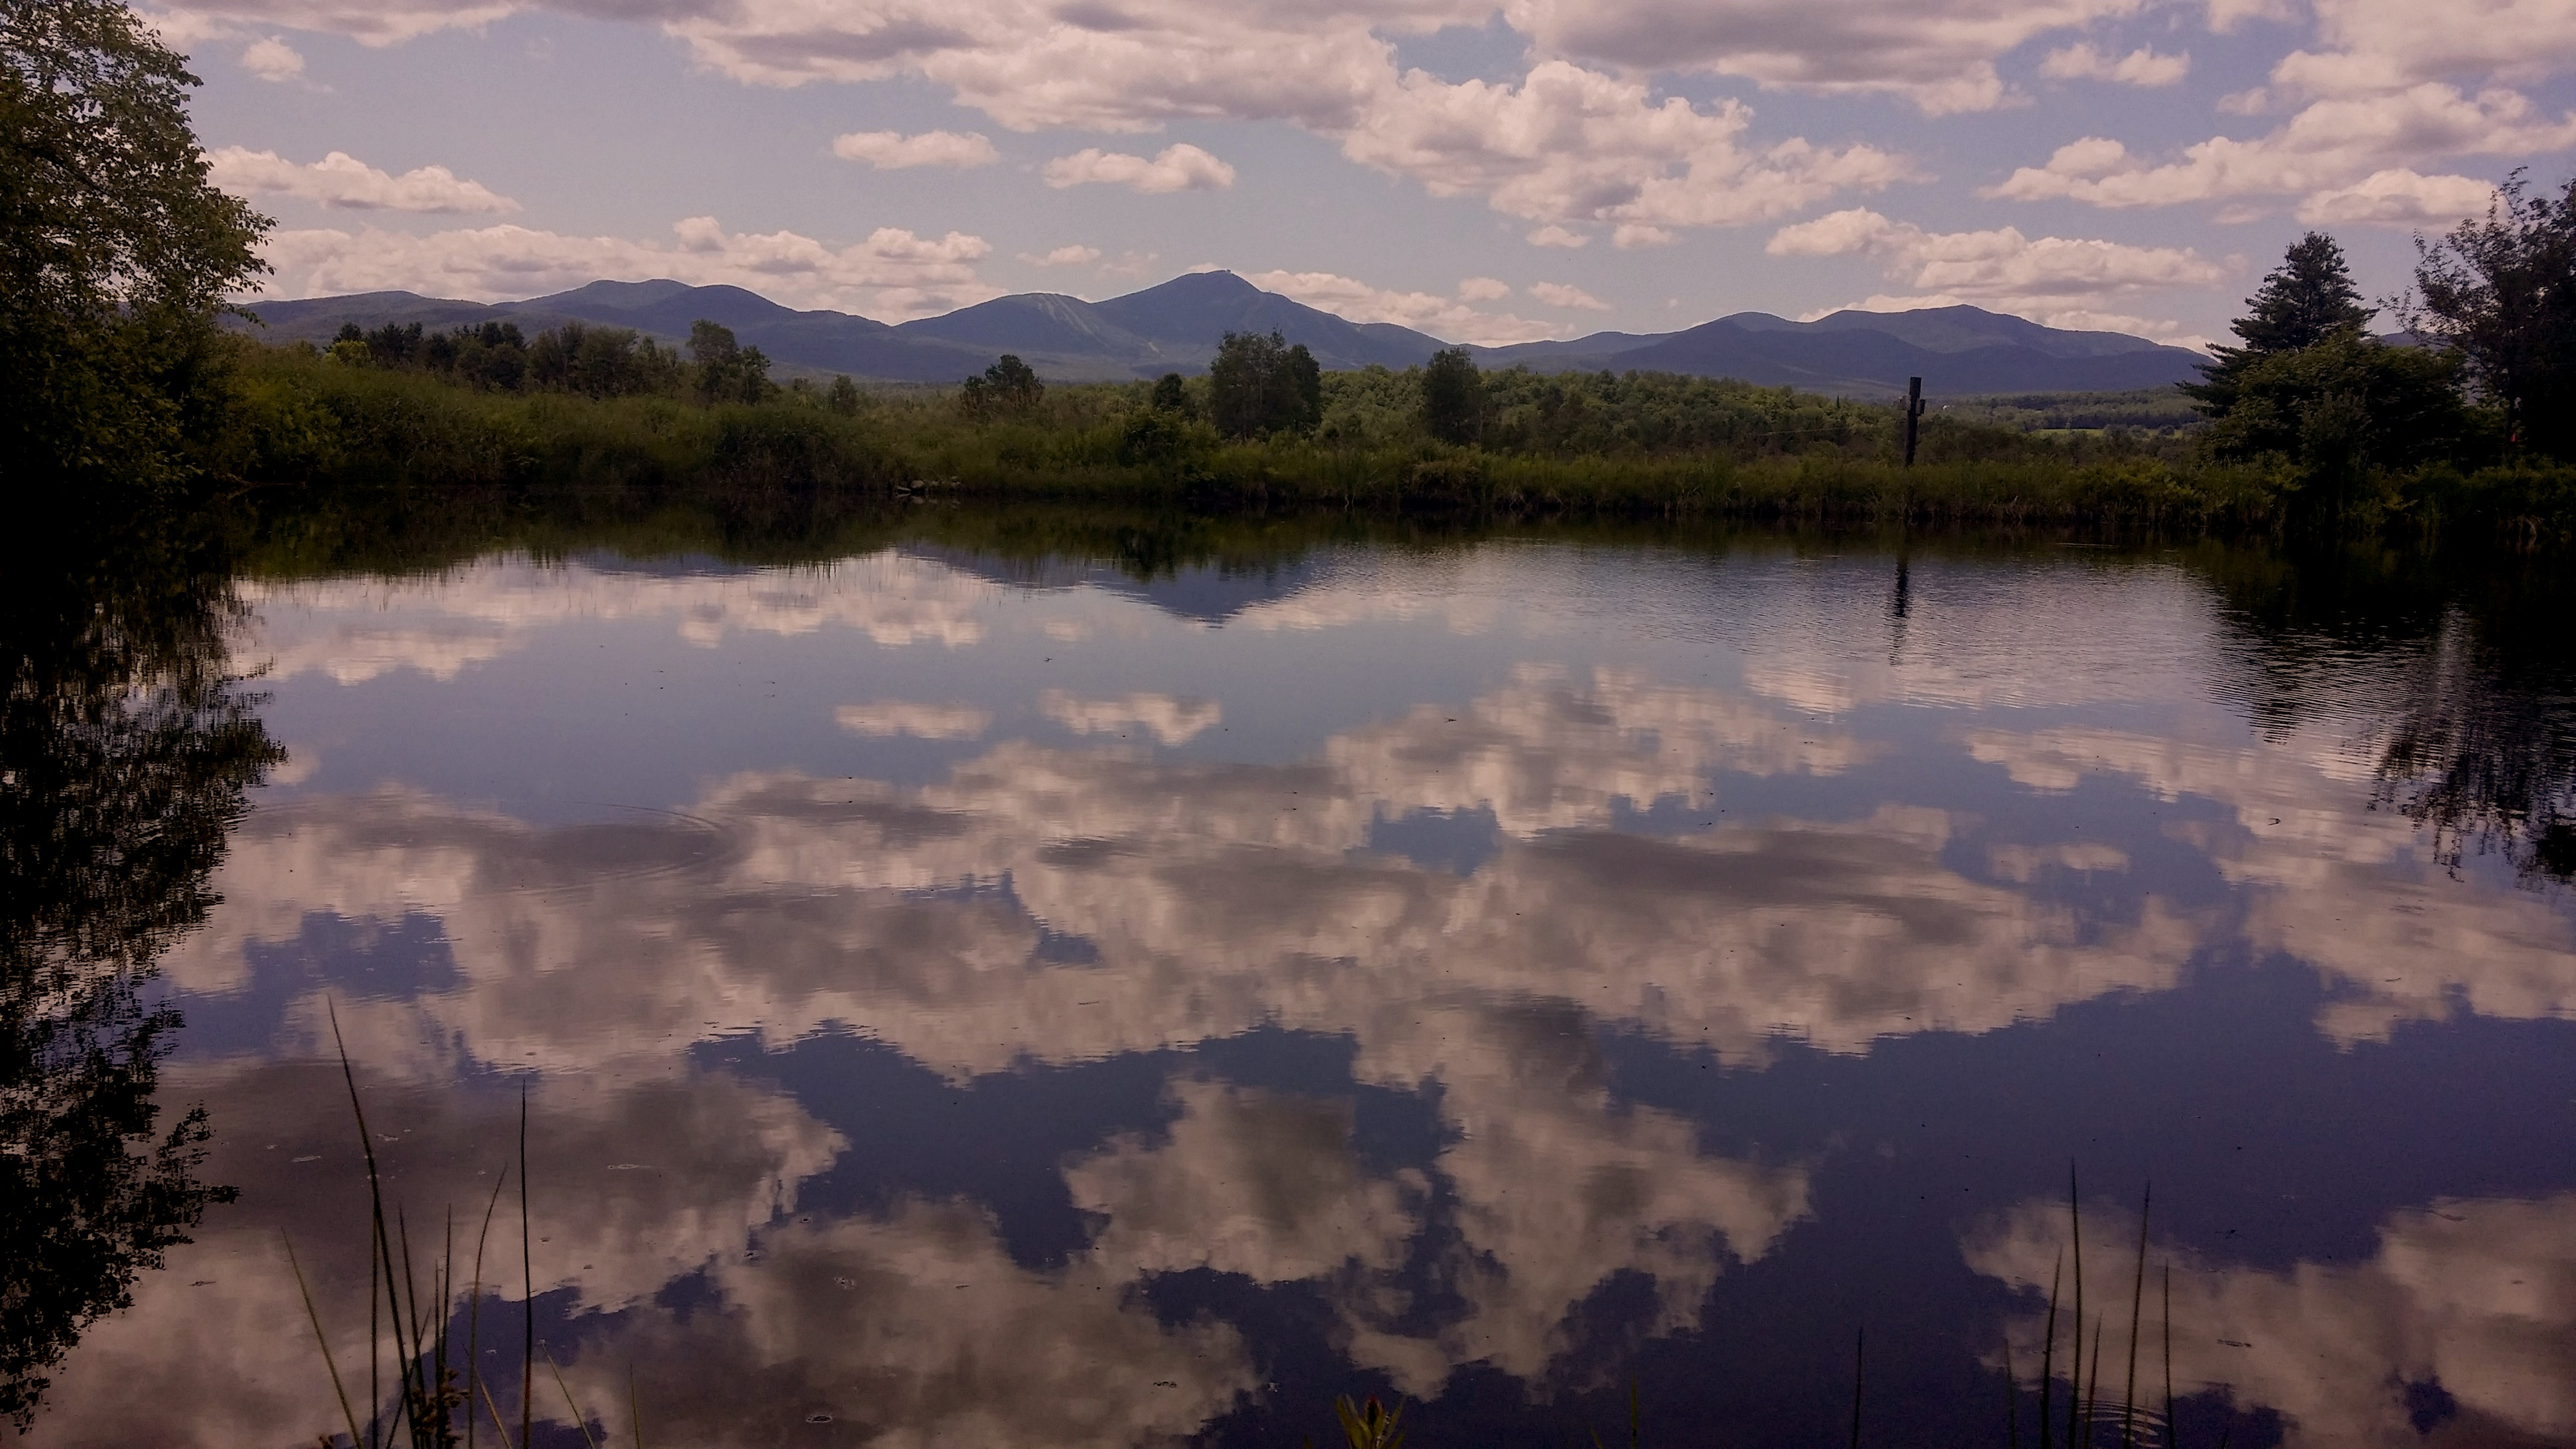 20140711_Pond_under_clouds_copy.jpg